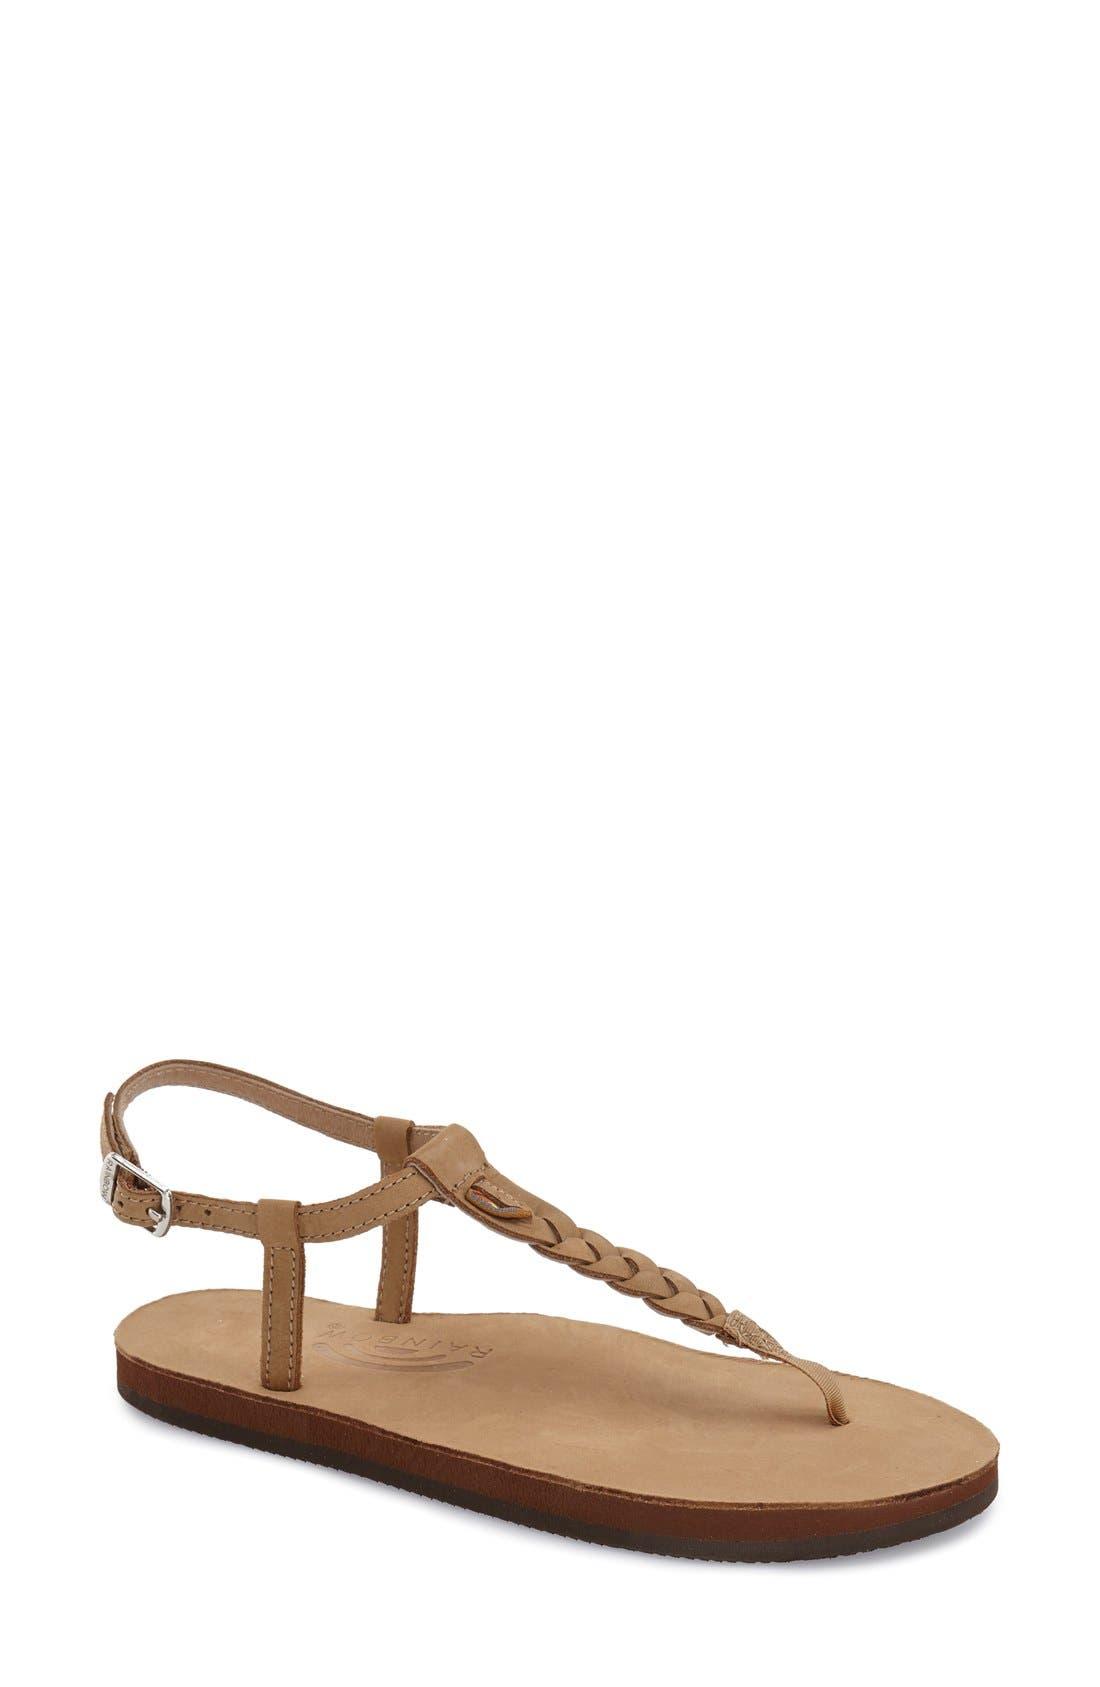 RAINBOW 'T-Street' Braided T-Strap Sandal